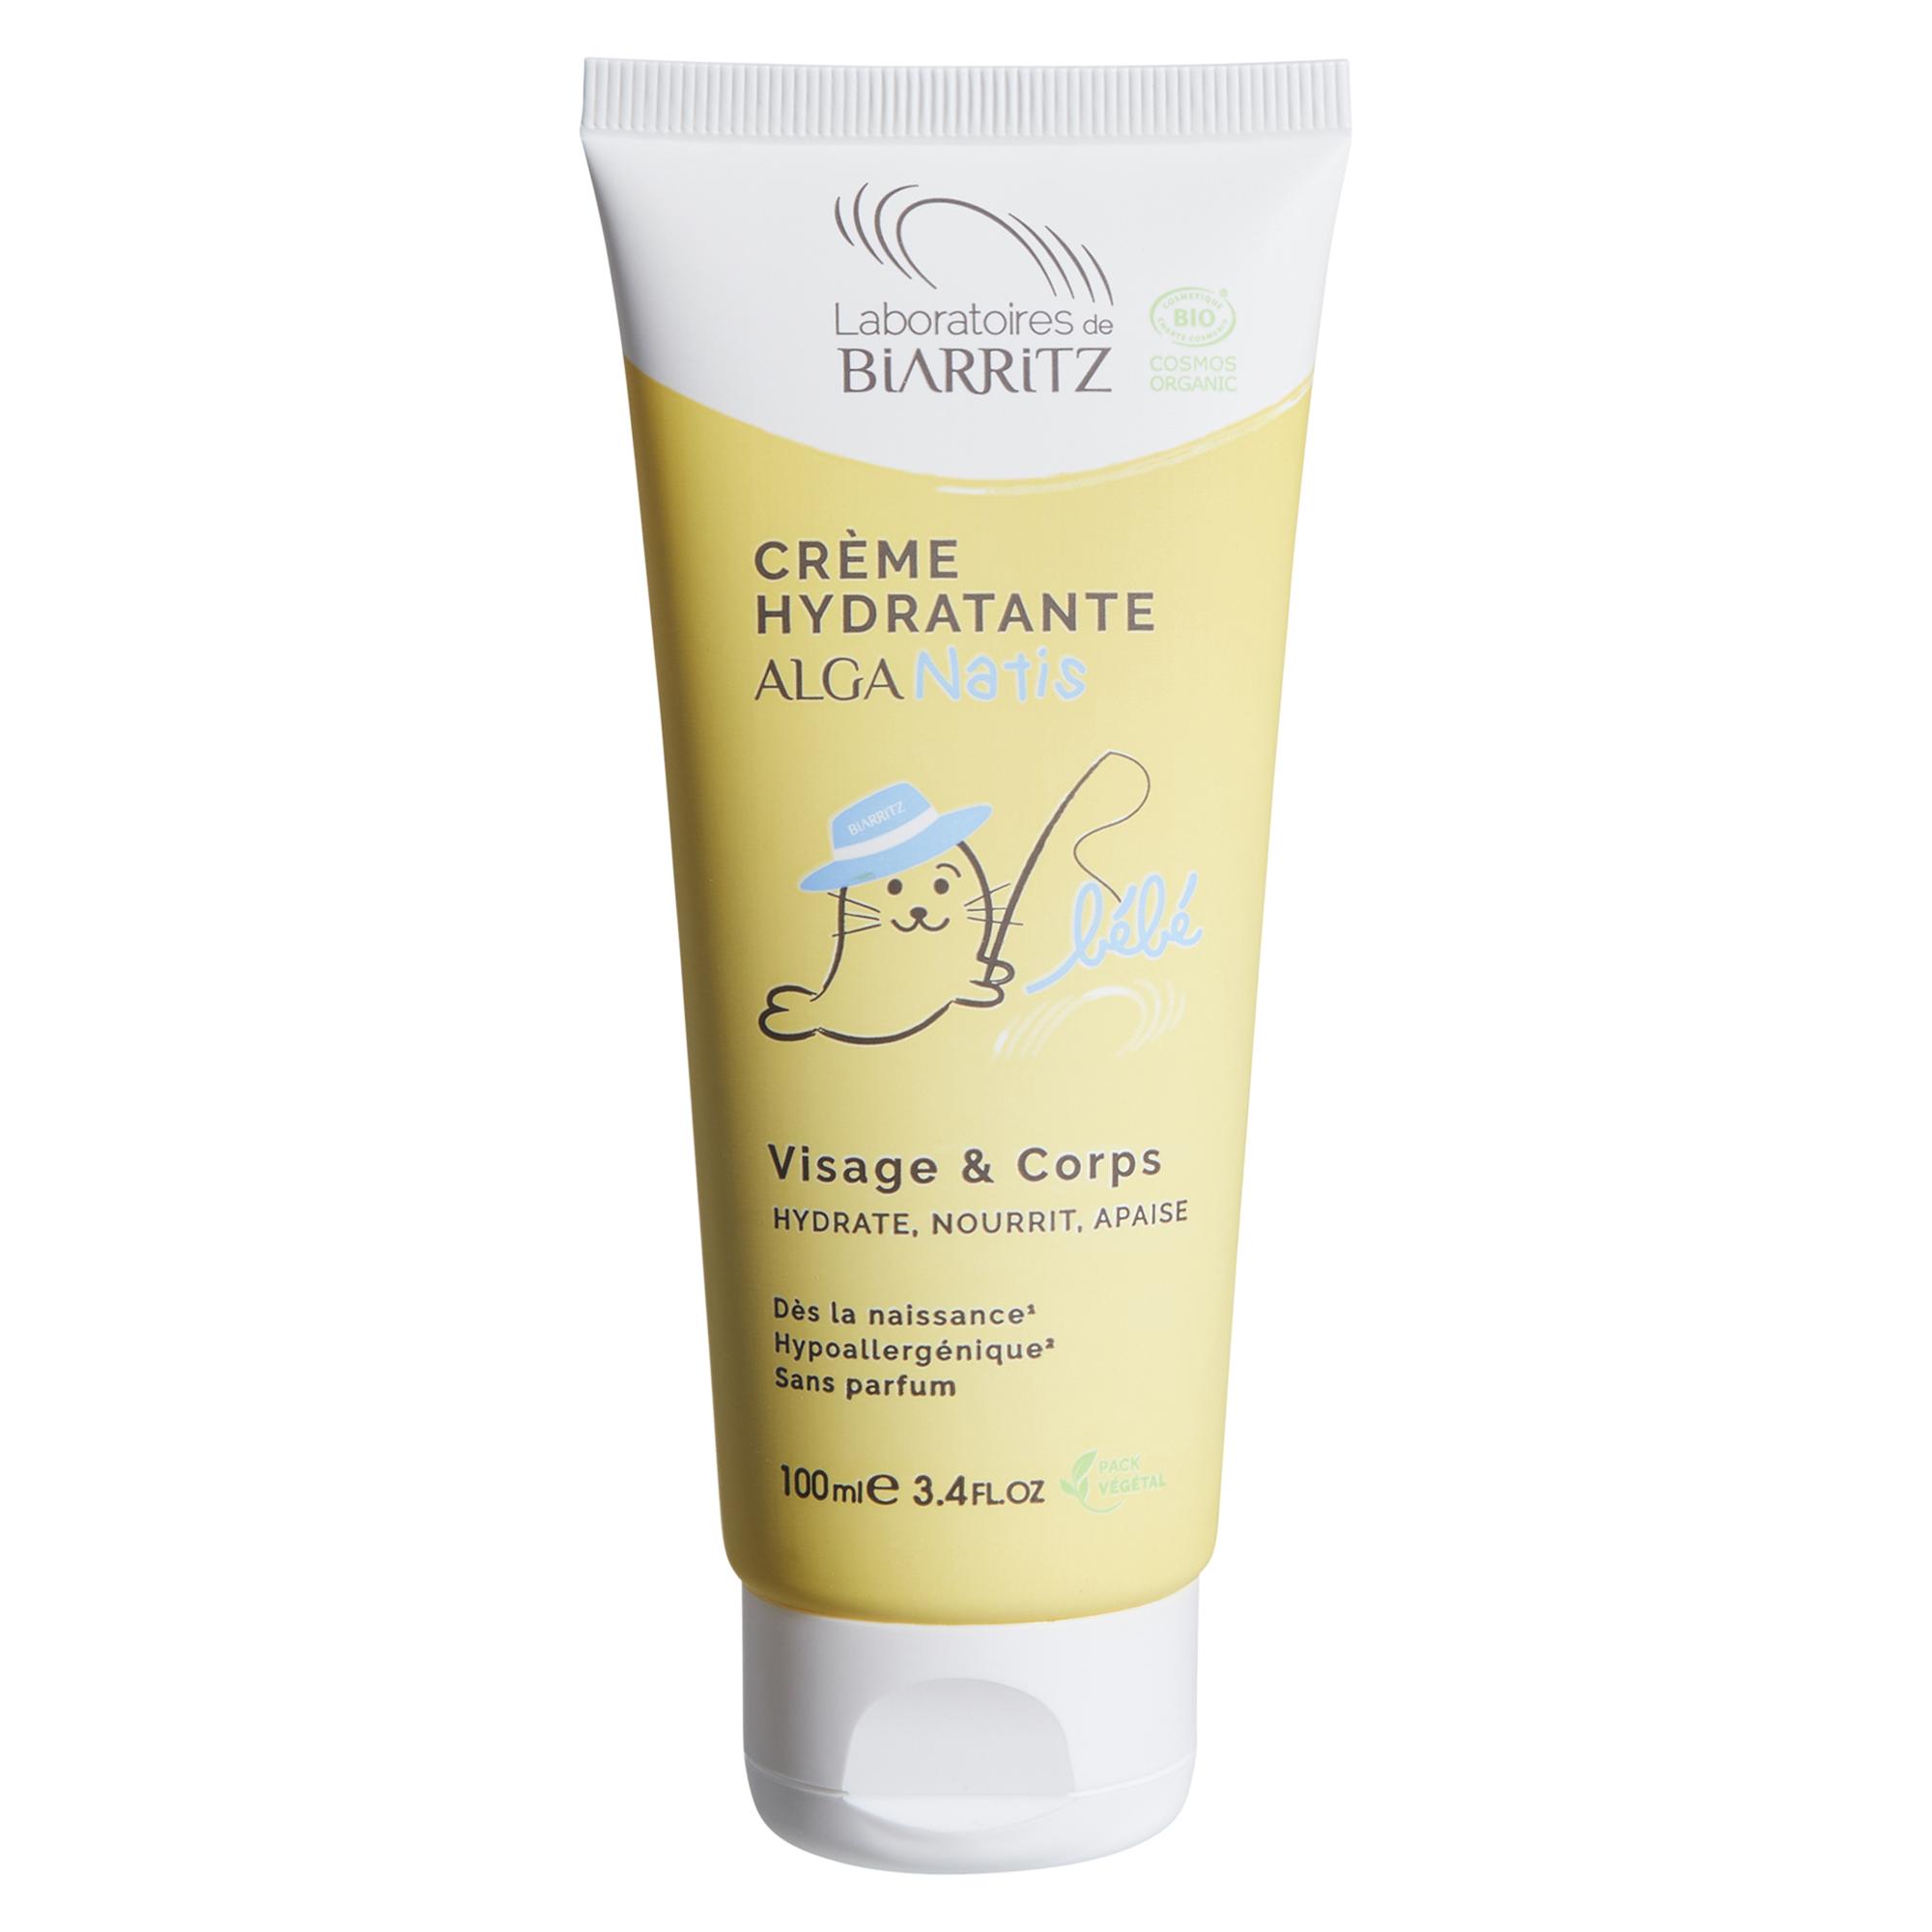 ALGANATIS - Crème hydratante LABORATOIRES DE BIARRITZ